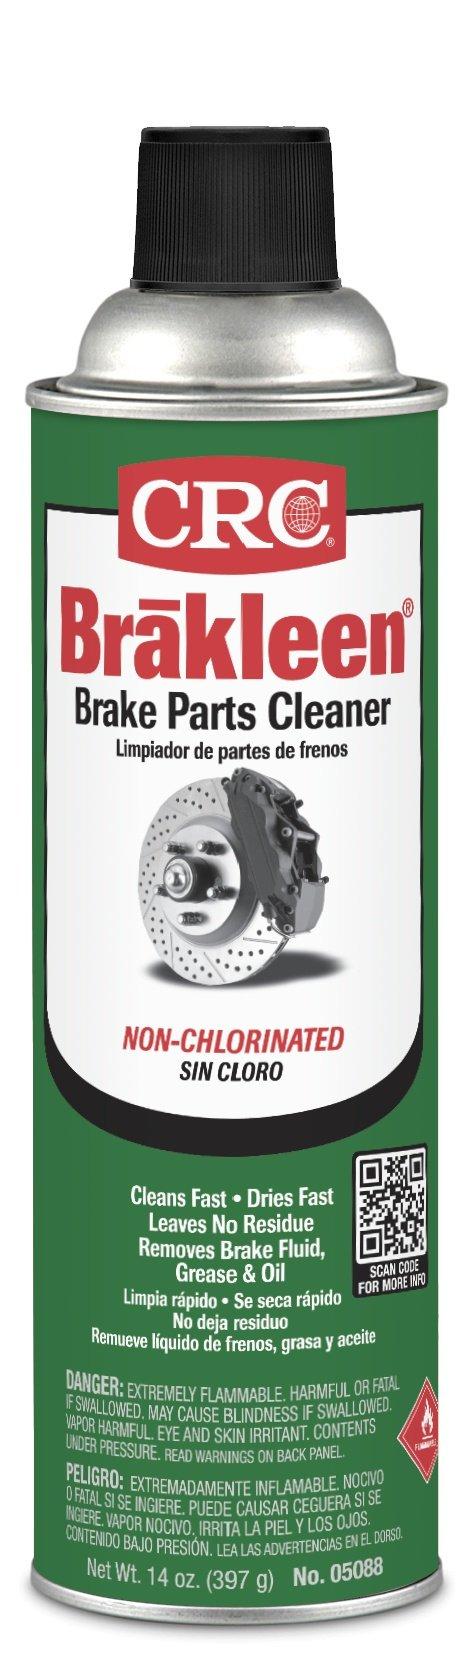 BRAKLEEN--NON-CHLORINATED --15 OZ. AEROSOL